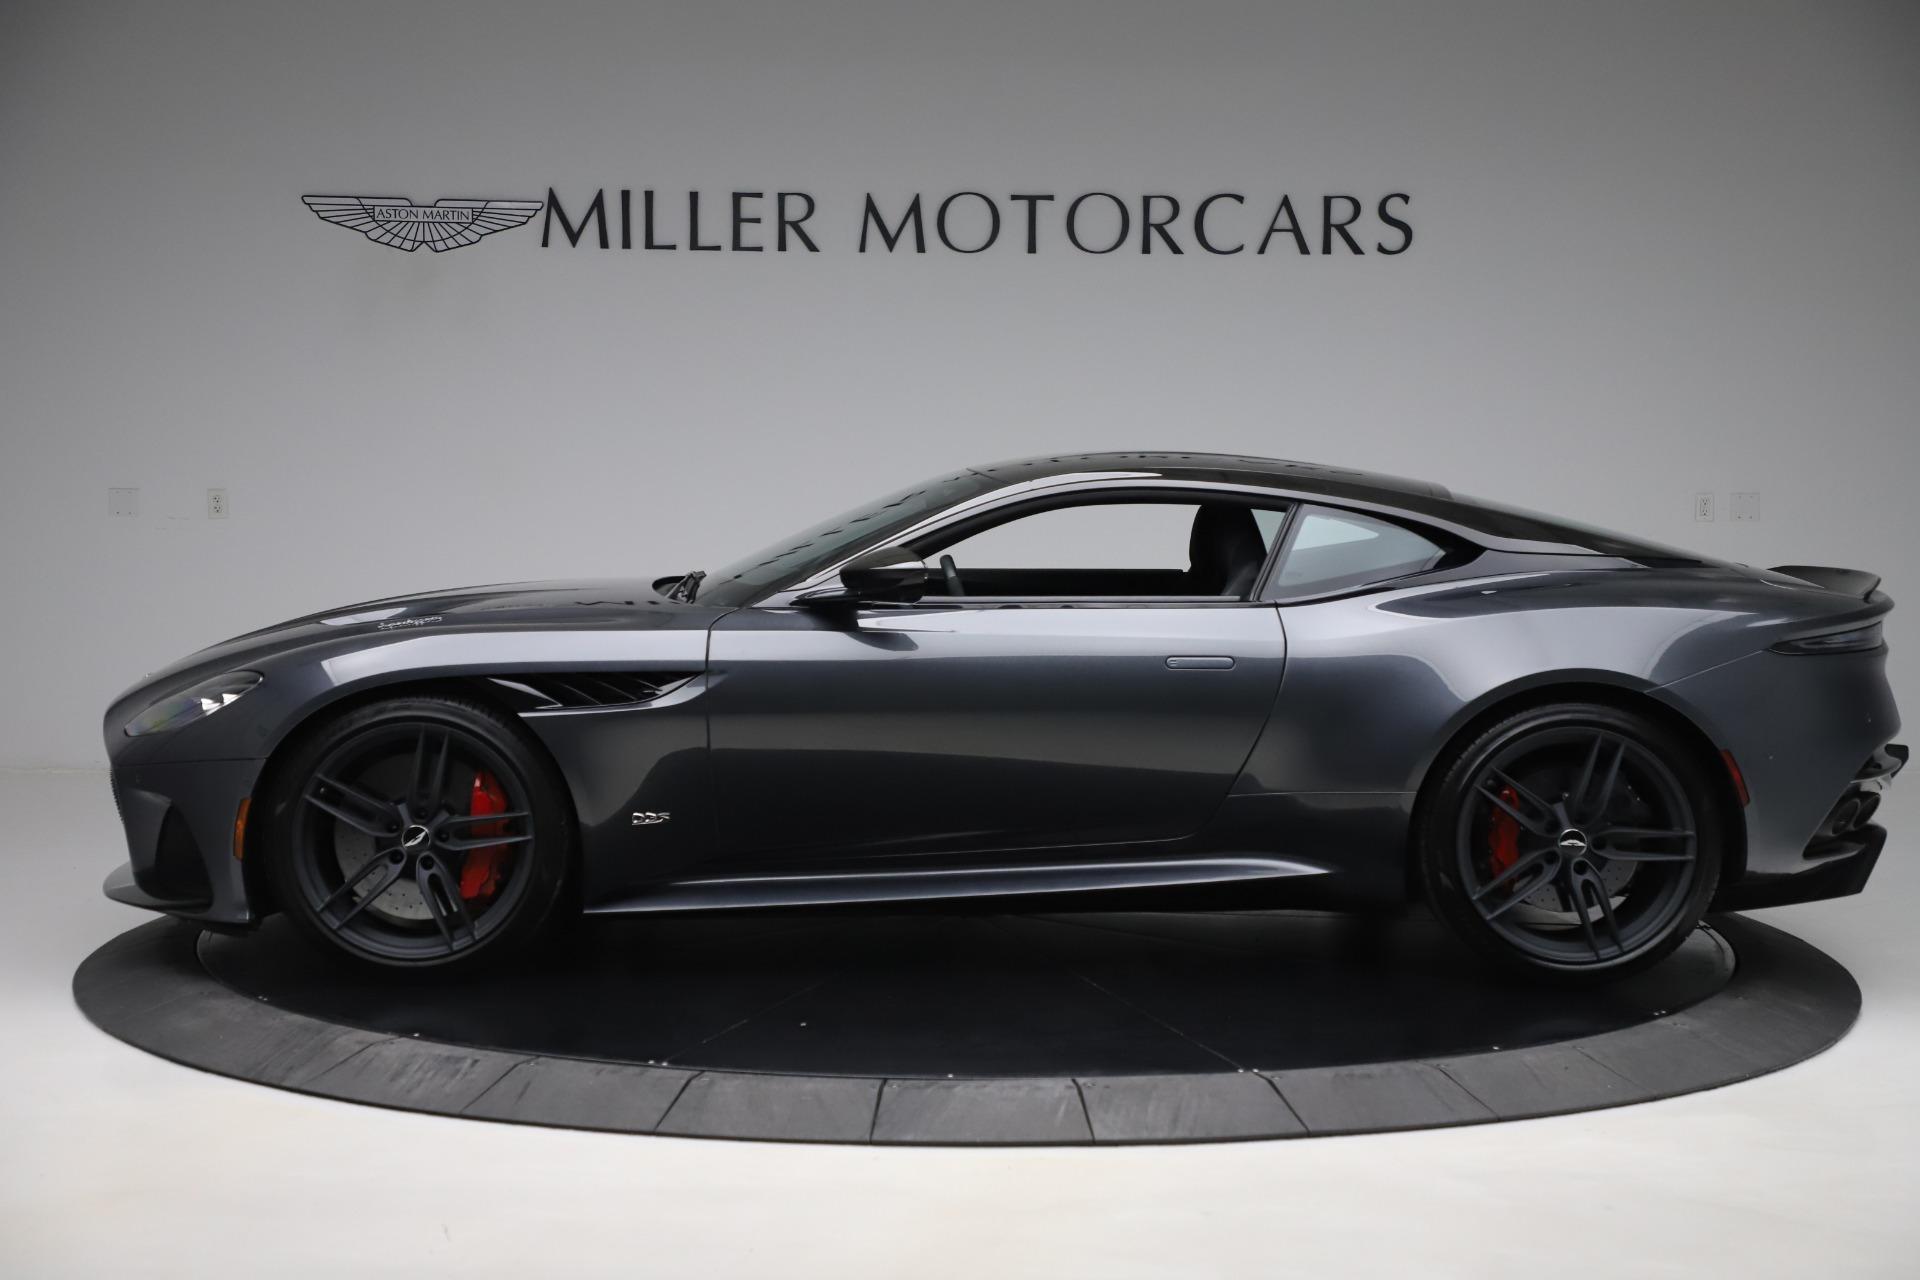 Used 2019 Aston Martin DBS Superleggera Coupe For Sale In Greenwich, CT. Alfa Romeo of Greenwich, A1438B 3570_p3